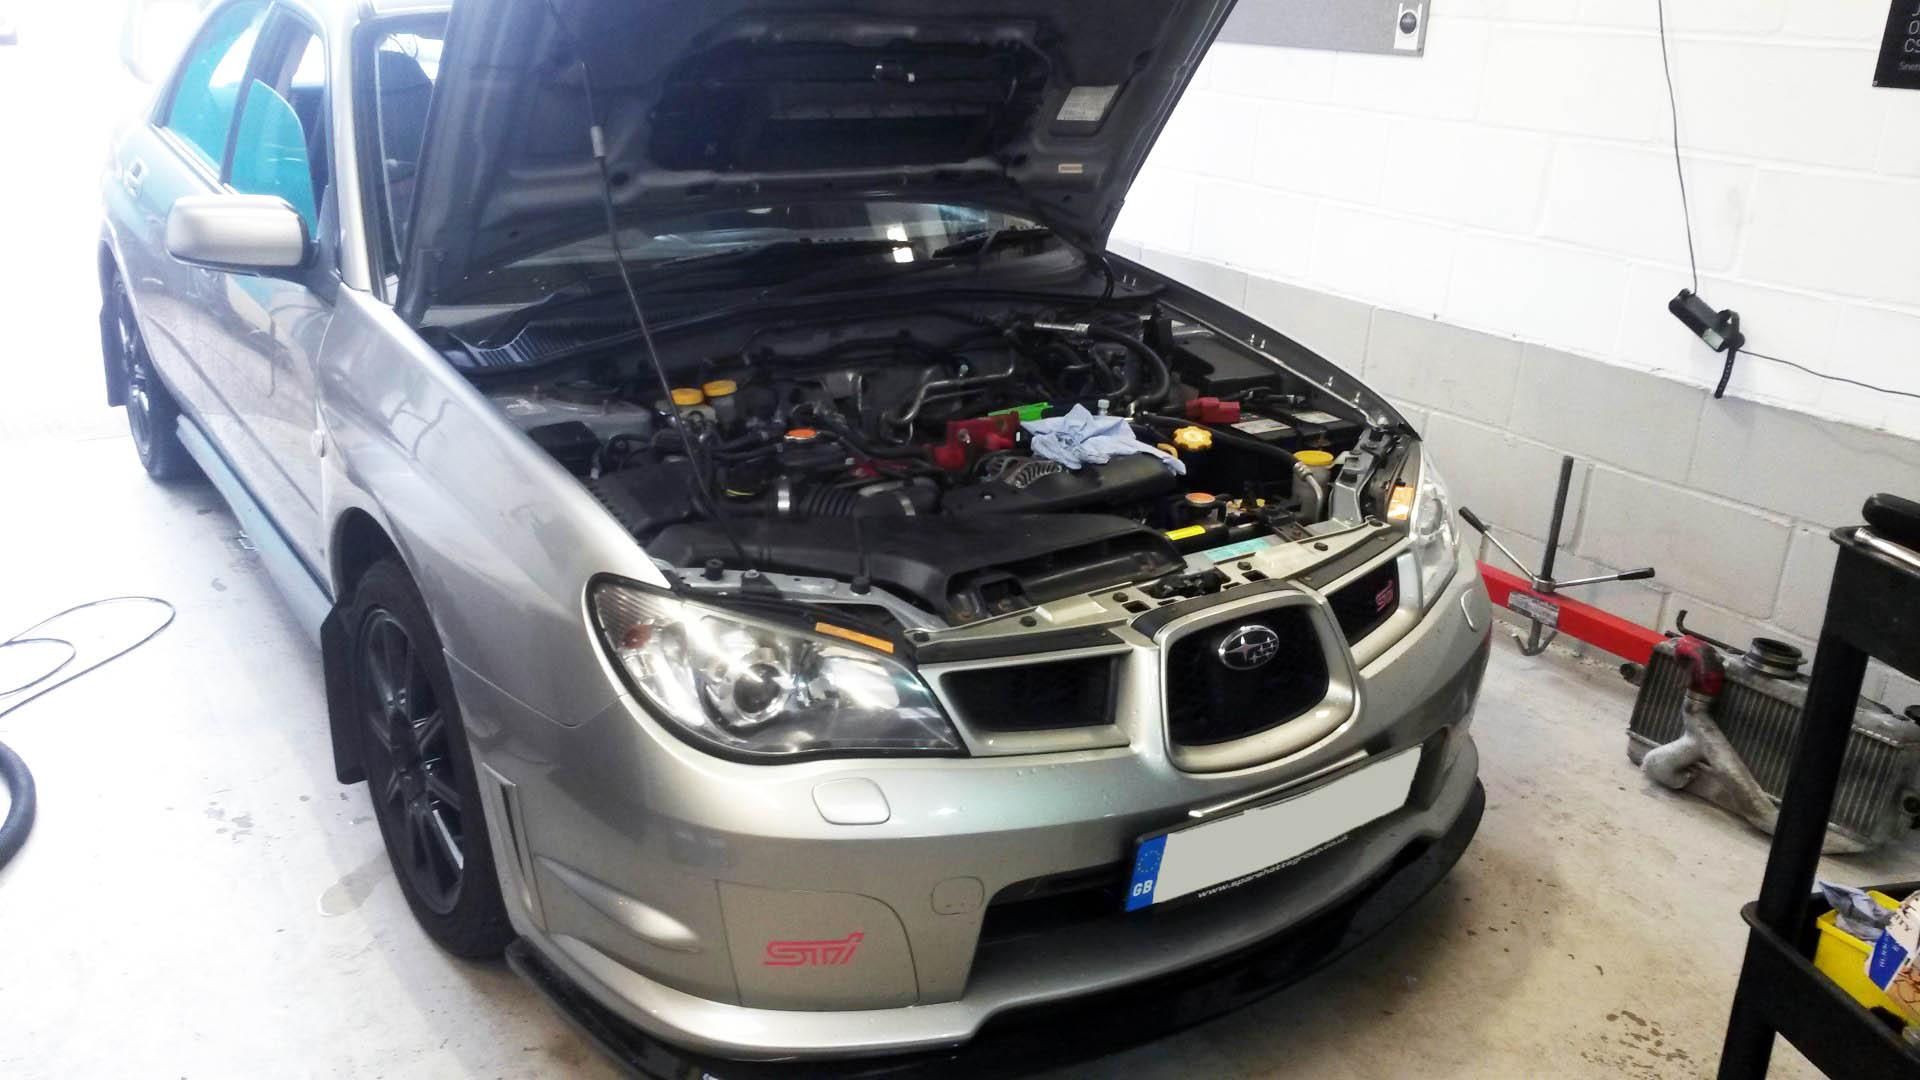 Subaru impreza servicing maintenance and tuning london perfect touch undefined altavistaventures Gallery